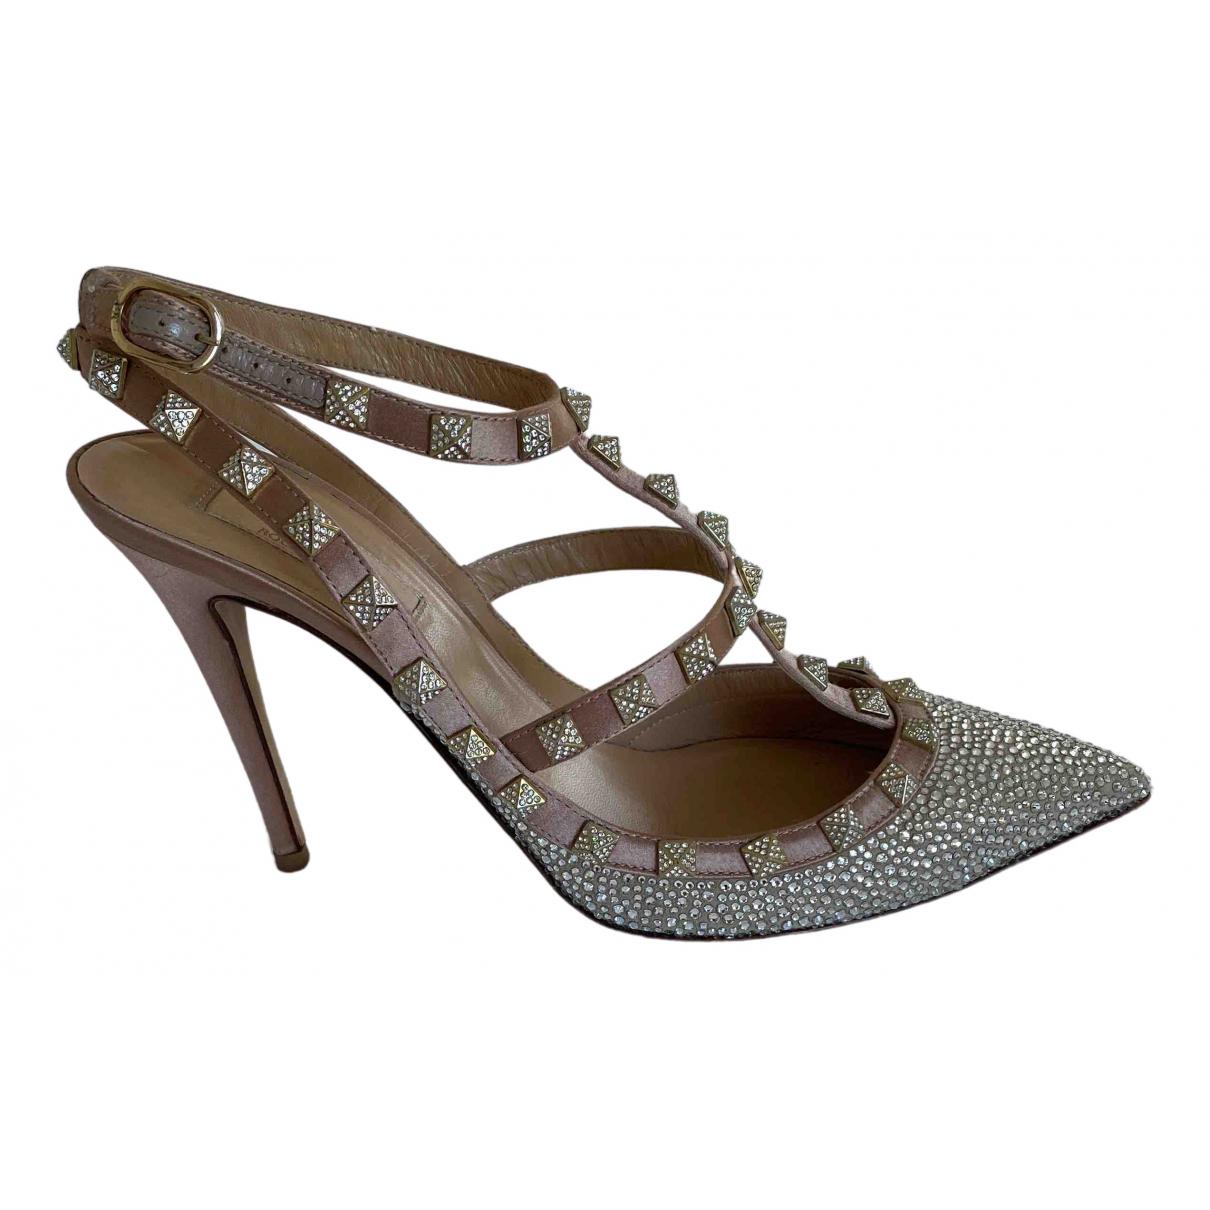 Valentino Garavani Rockstud Beige Glitter Heels for Women 39.5 IT